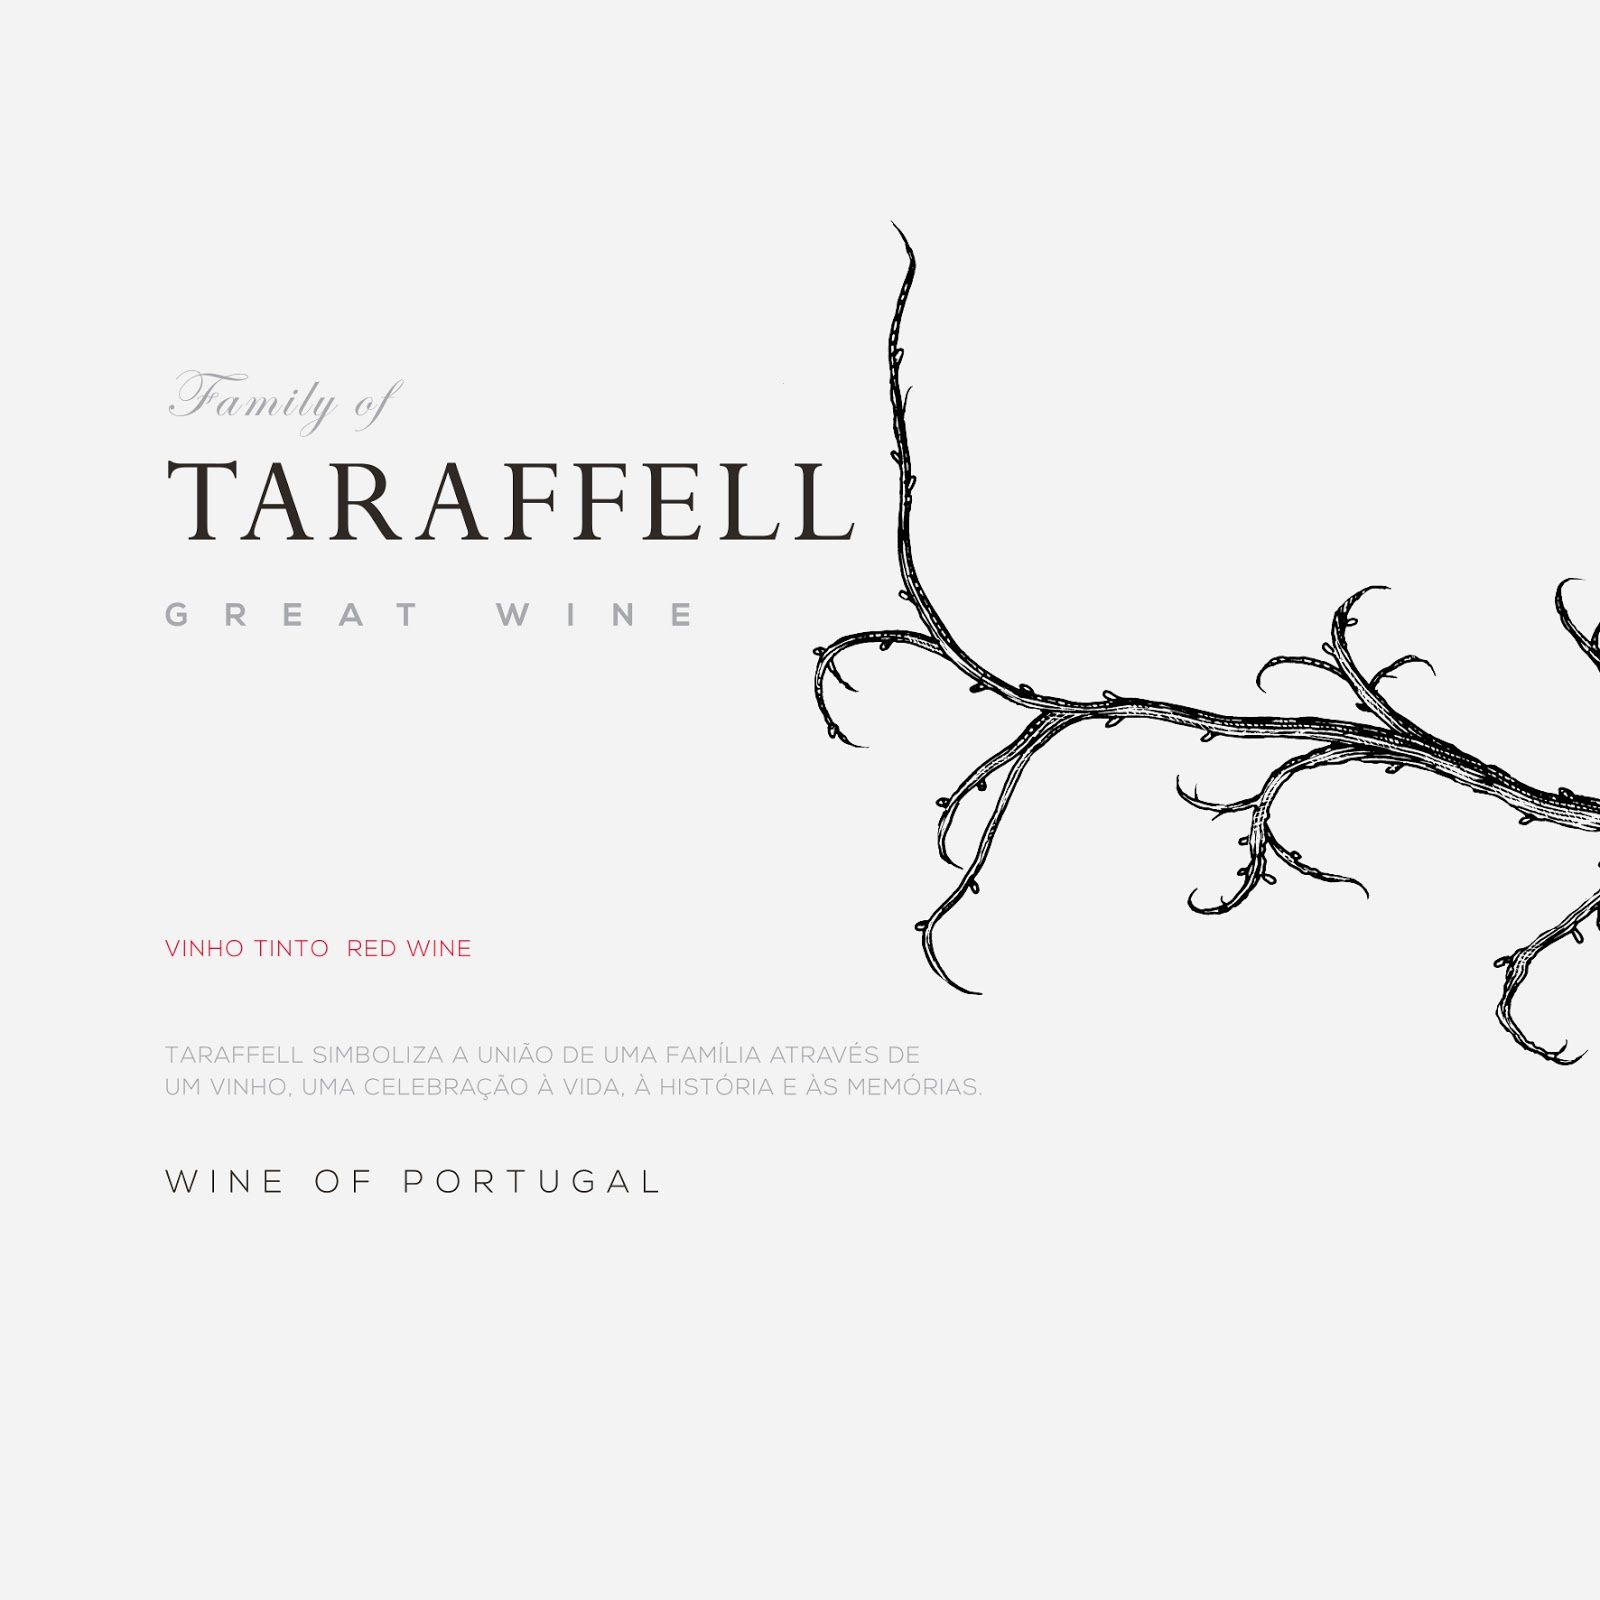 Tarafell Great Wine (vin portugais) I Design : Nektar Brand Advertisers, Luxembourg (mars 2017)